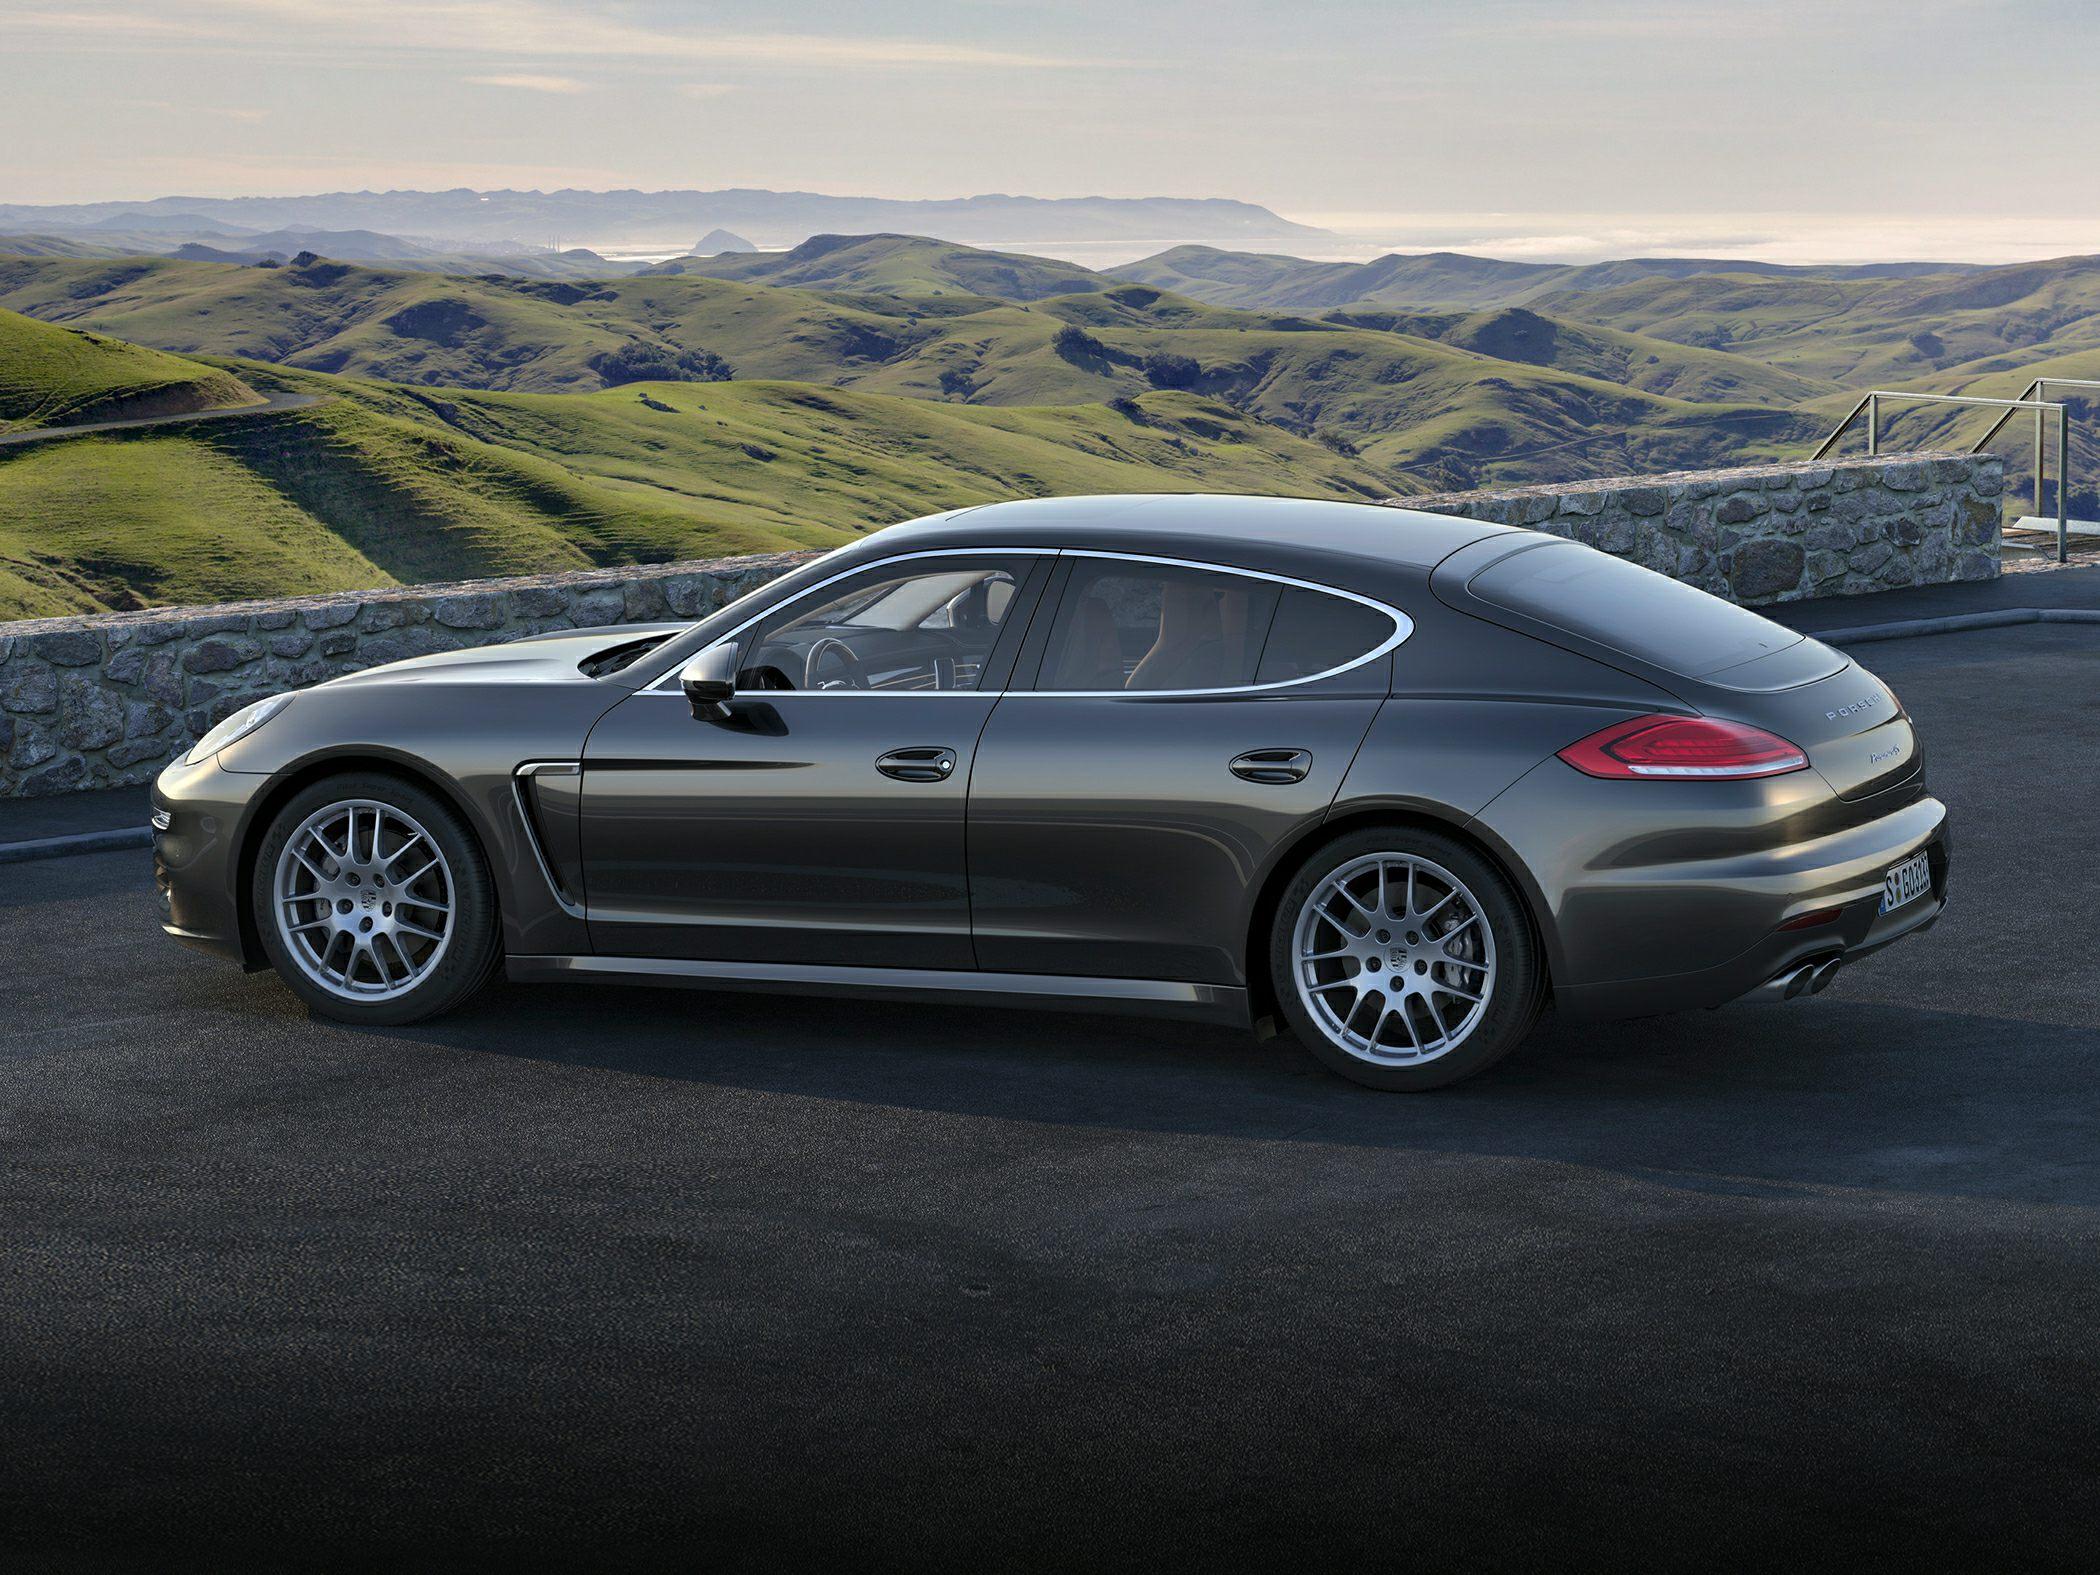 2014 Porsche Panamera Glam